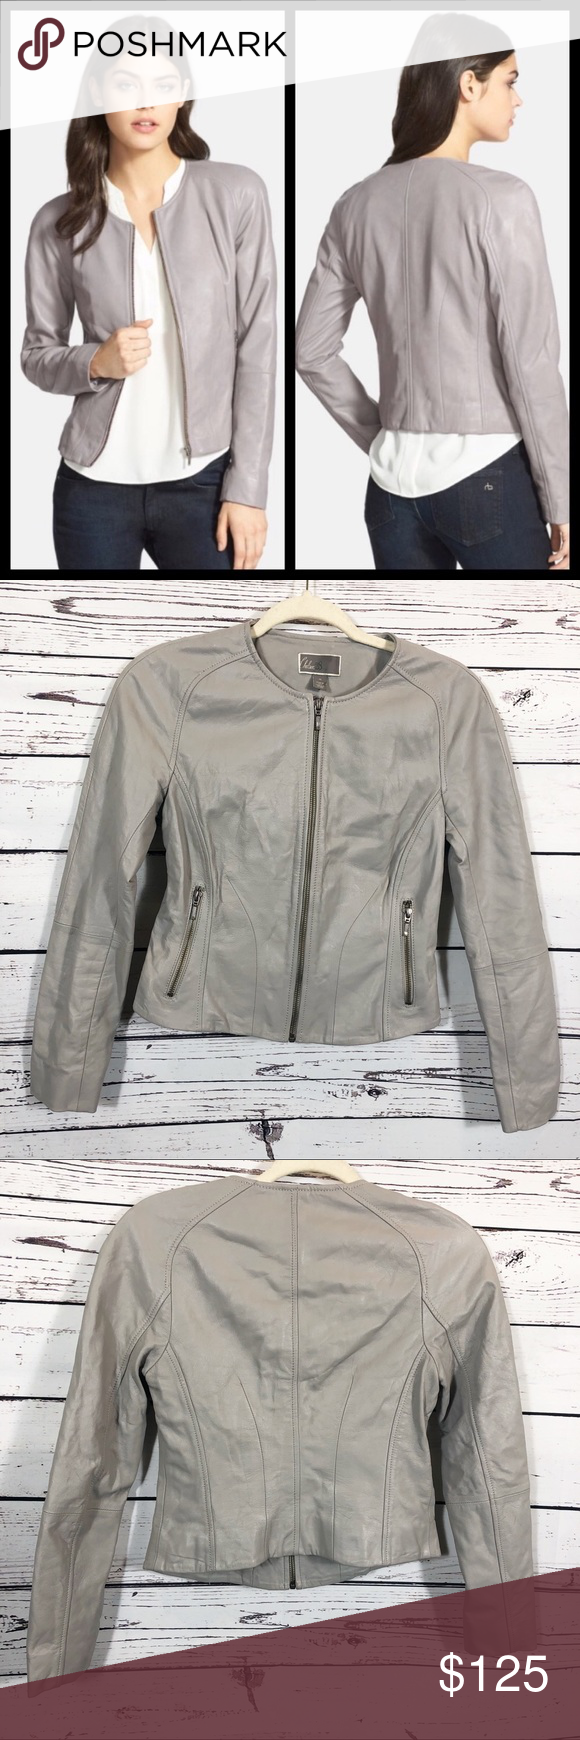 Chelsea28 Leather Moto Jacket Grey Euc Chelsea28 Genuine Leather Moto Jacket Grey Front Zippered Pockets Excellen Leather Moto Jacket Chelsea28 Moto Jacket [ 1740 x 580 Pixel ]